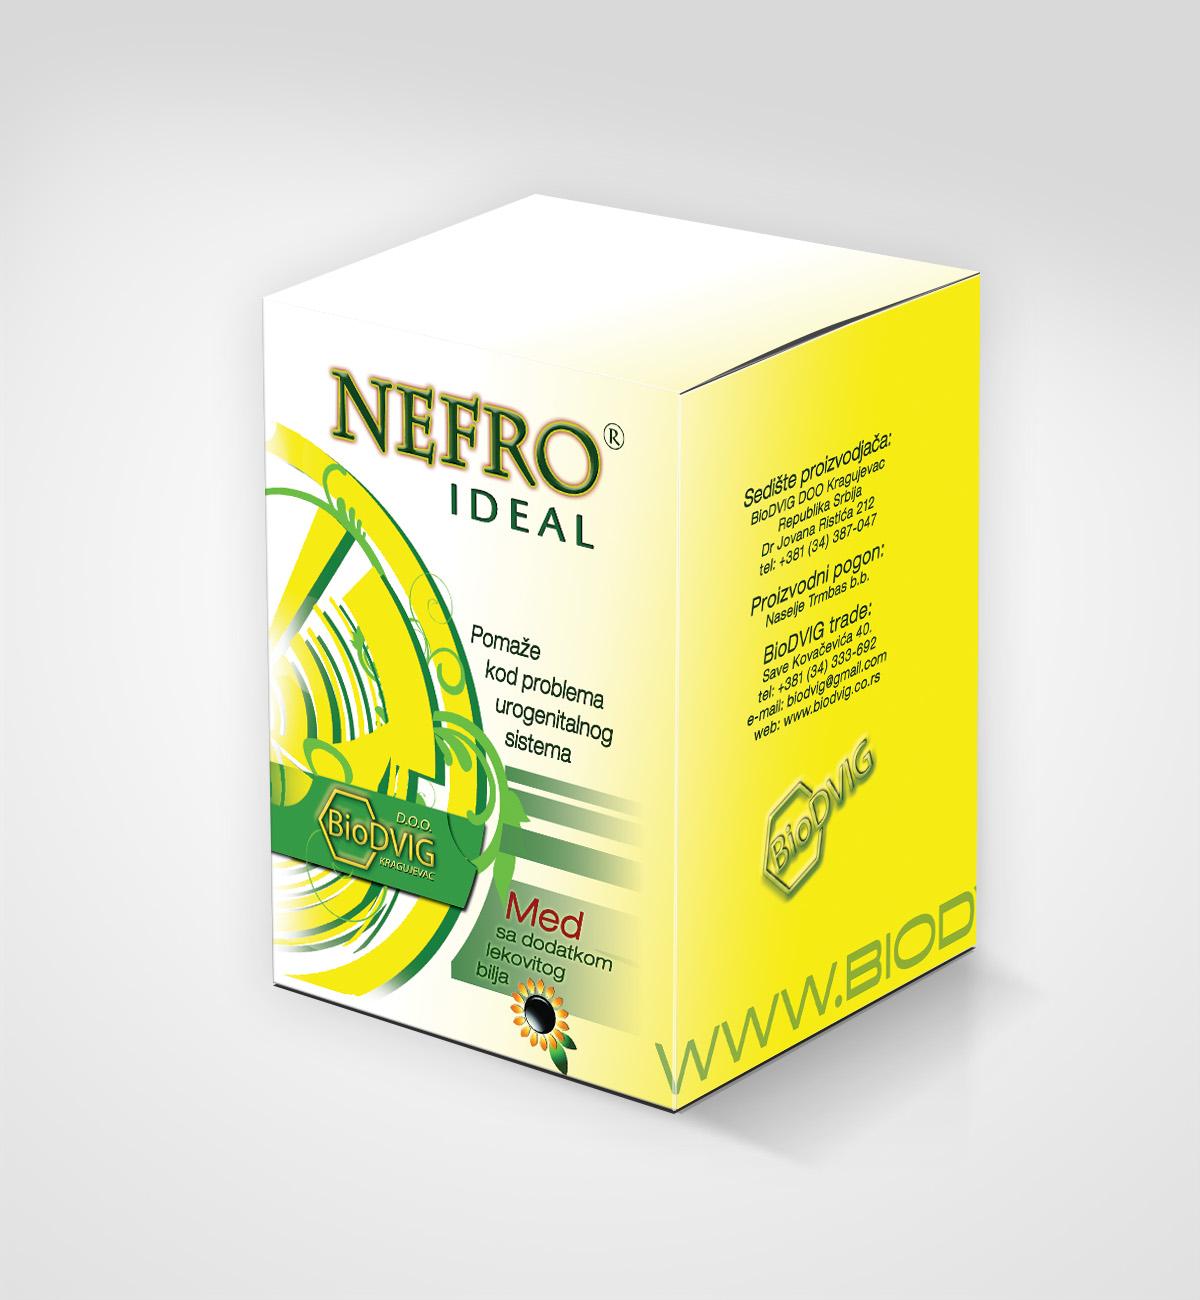 Nefro Ideal - biodvig DOO